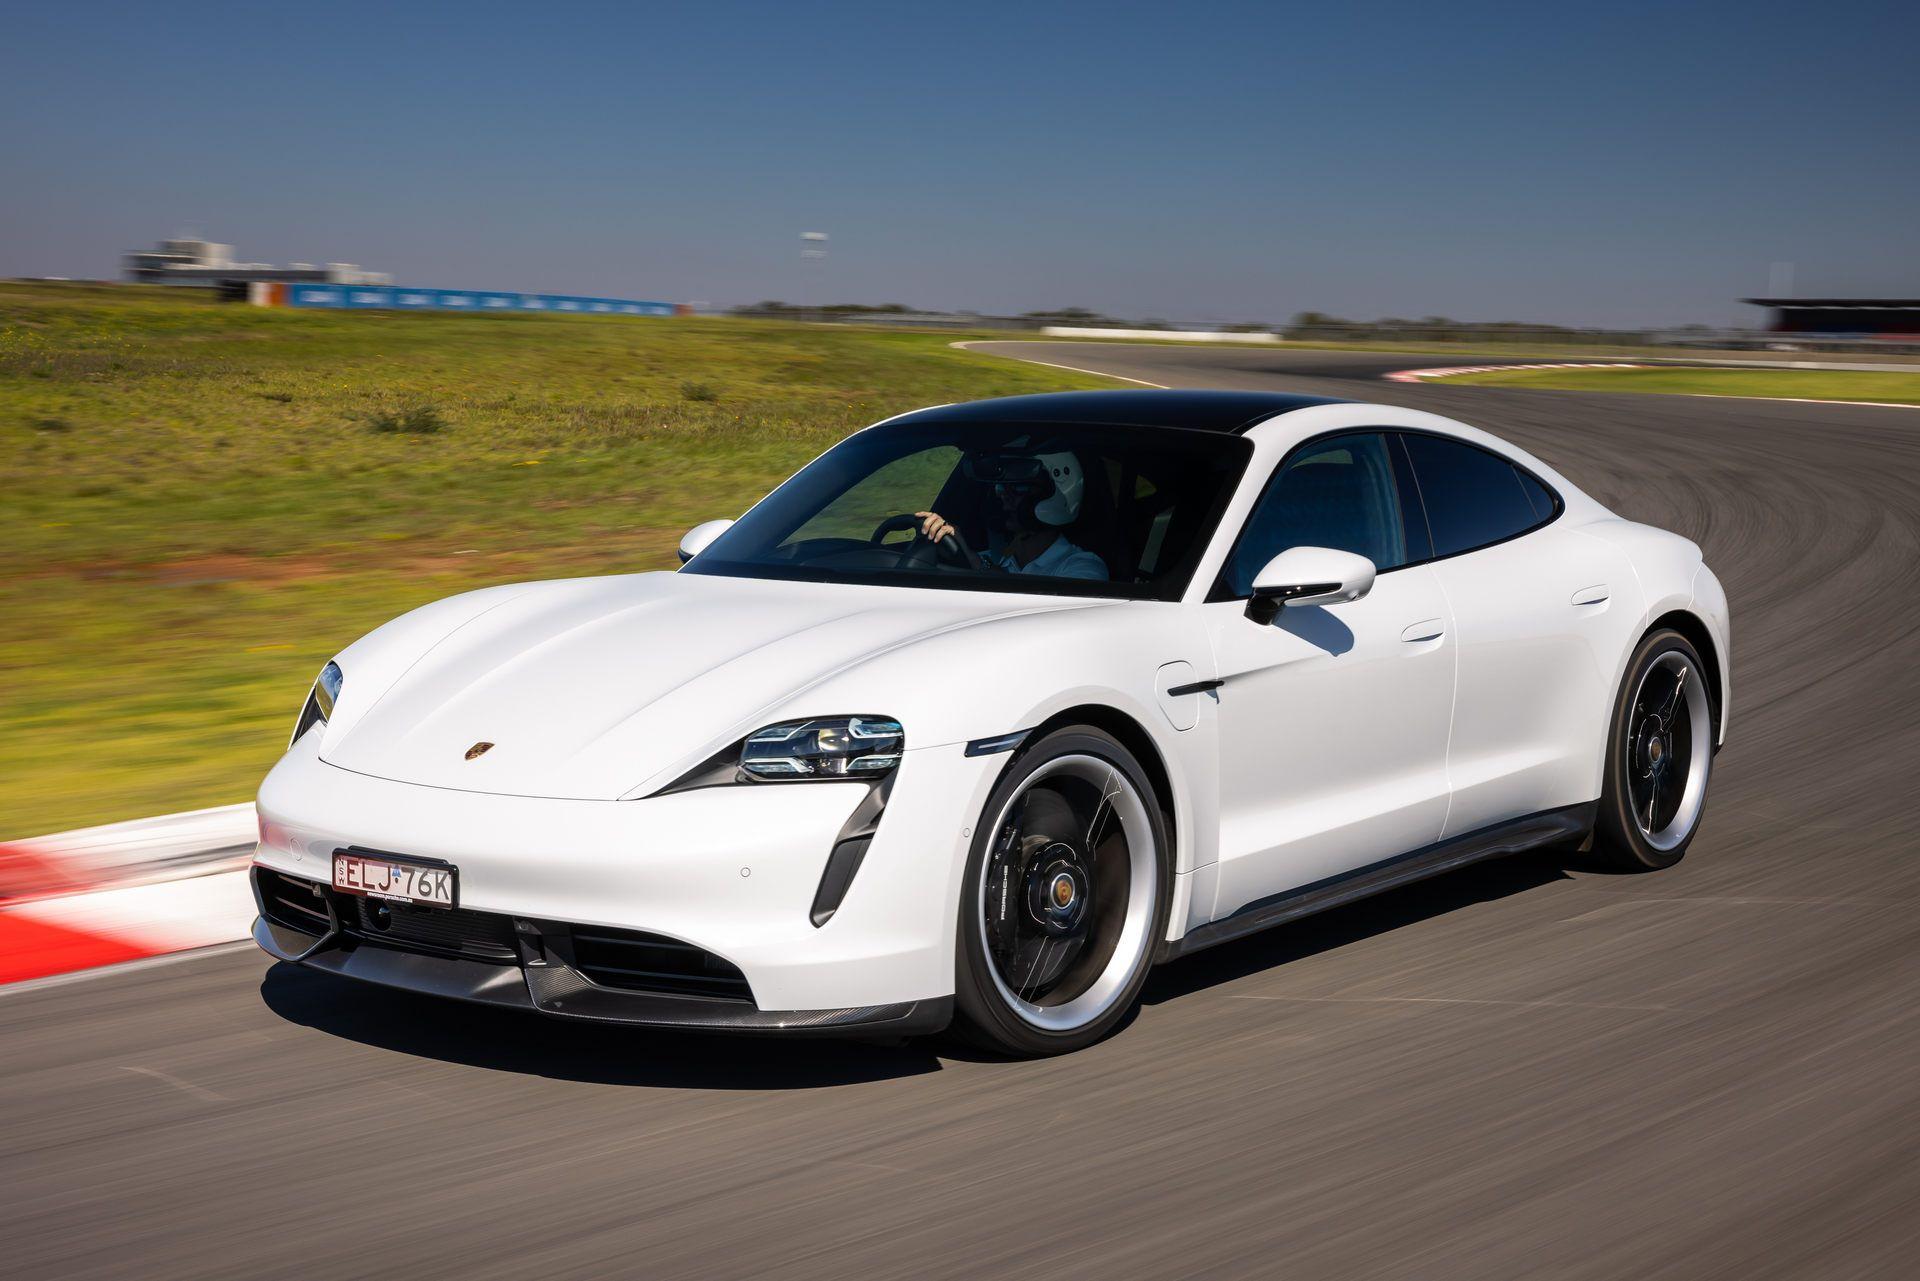 Porsche-Taycan-Turbo-S-The-Bend-Motorsport-Park-44